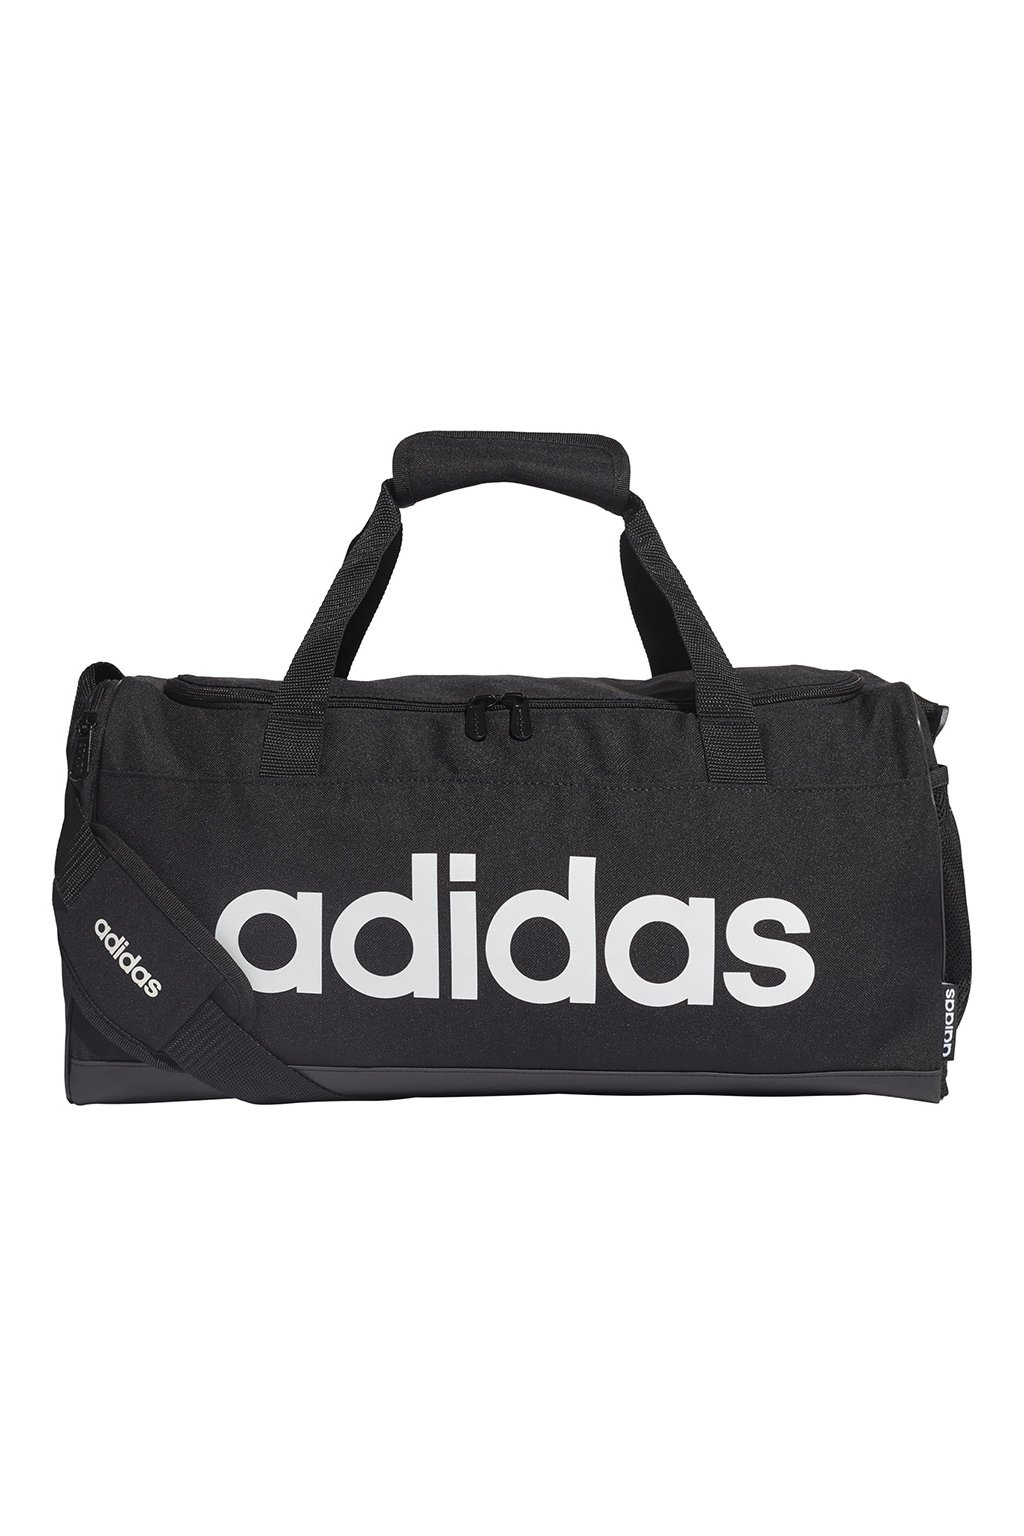 Taška Adidas Lin Duffle S čierna FL3693